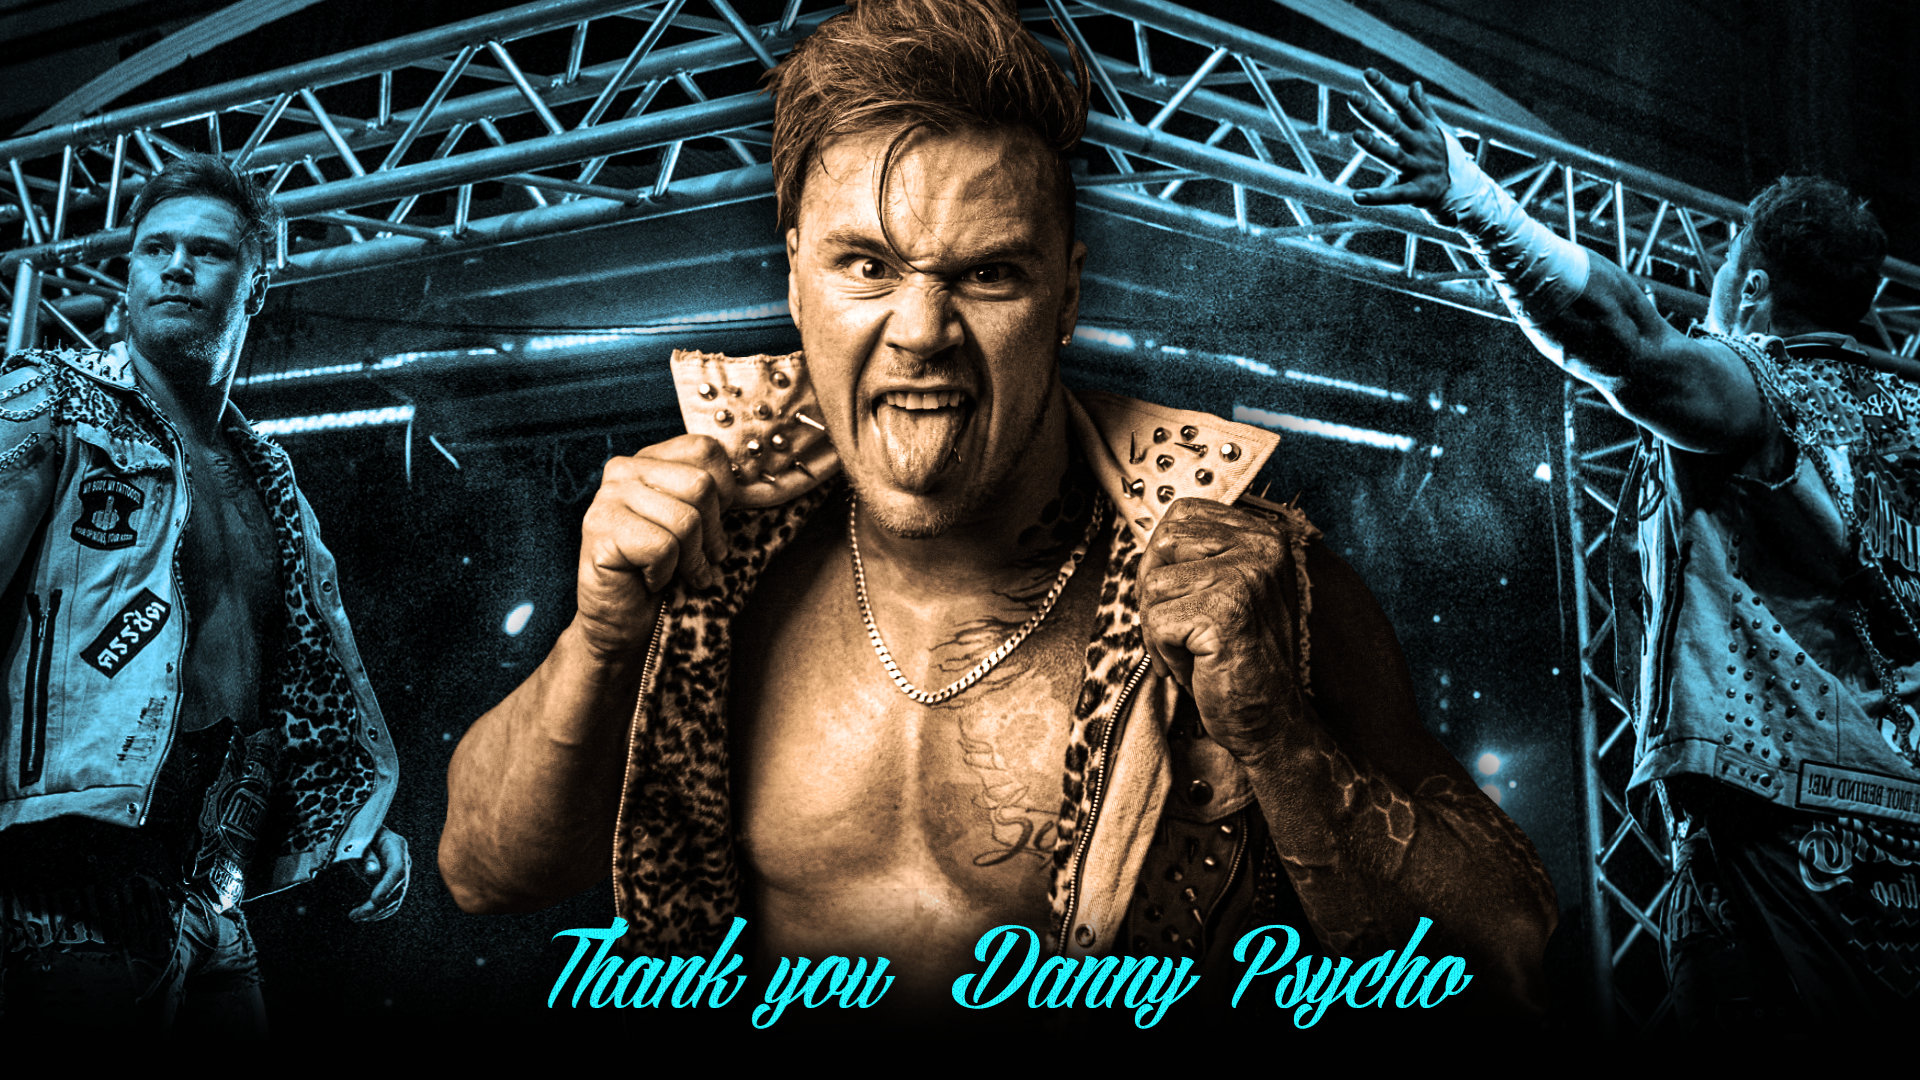 Danny Psycho Retires